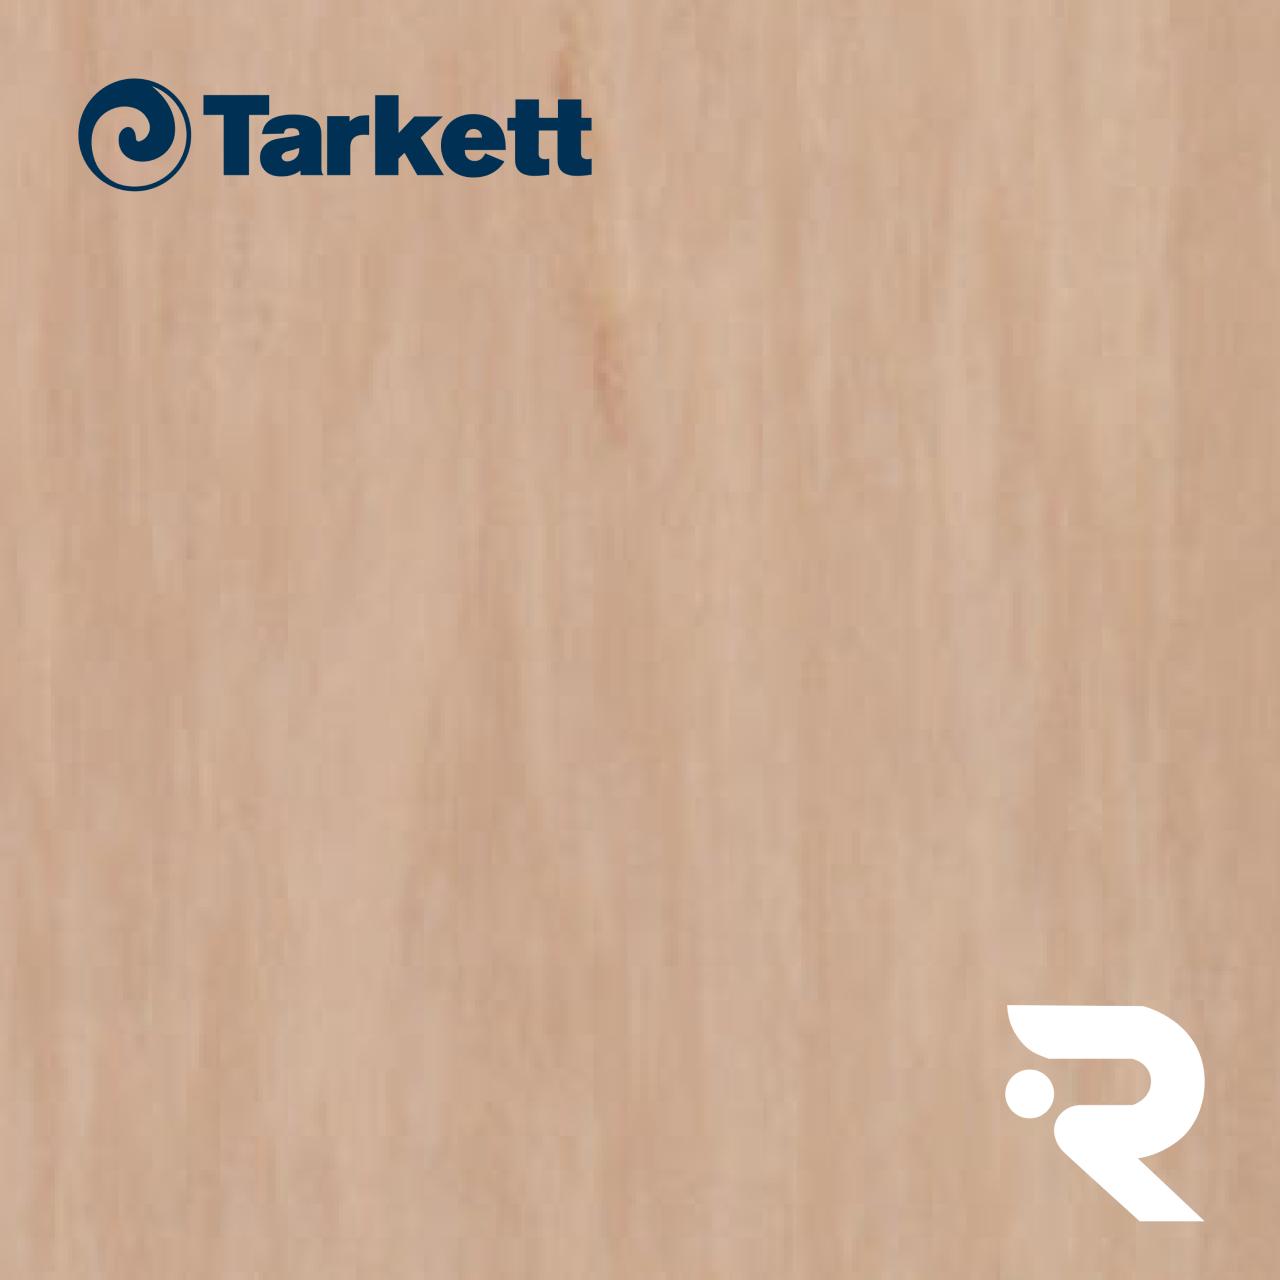 🏫 Гомогенний лінолеум Tarkett   Standard SAND MEDIUM 0914   Standard Plus 2.0 mm   2 х 23 м